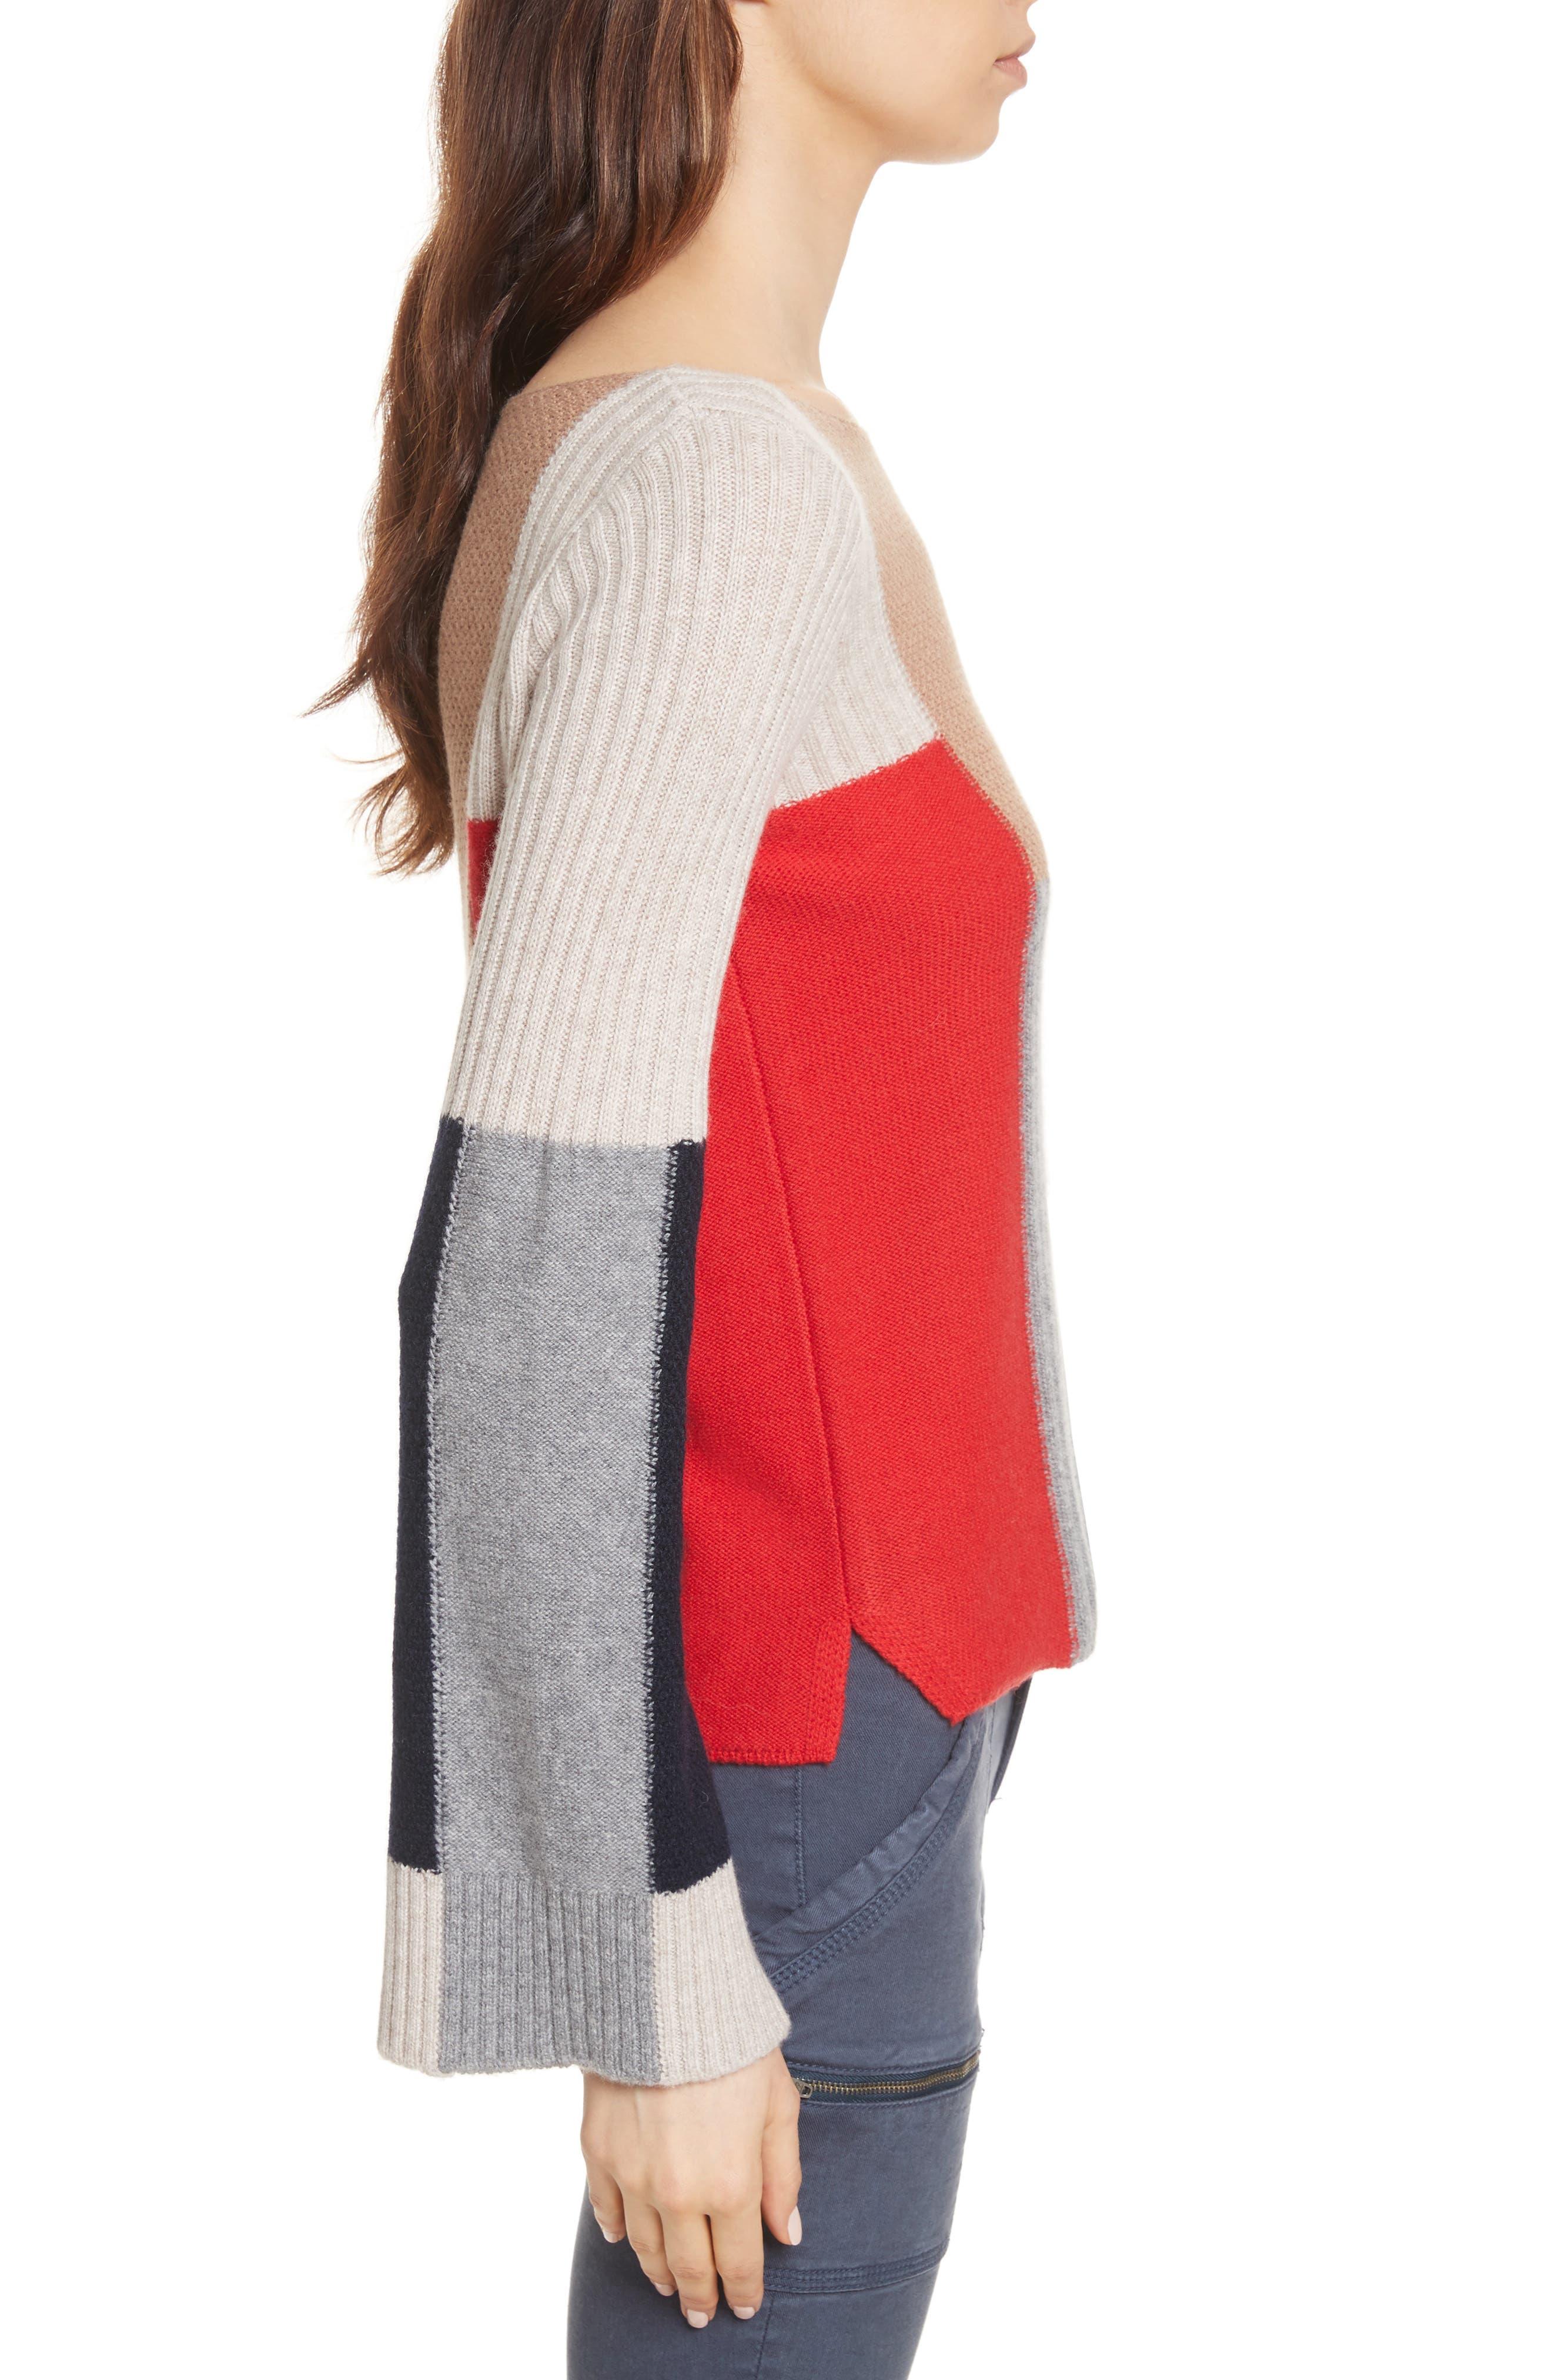 Adene Wool & Cashmere Sweater,                             Alternate thumbnail 3, color,                             641